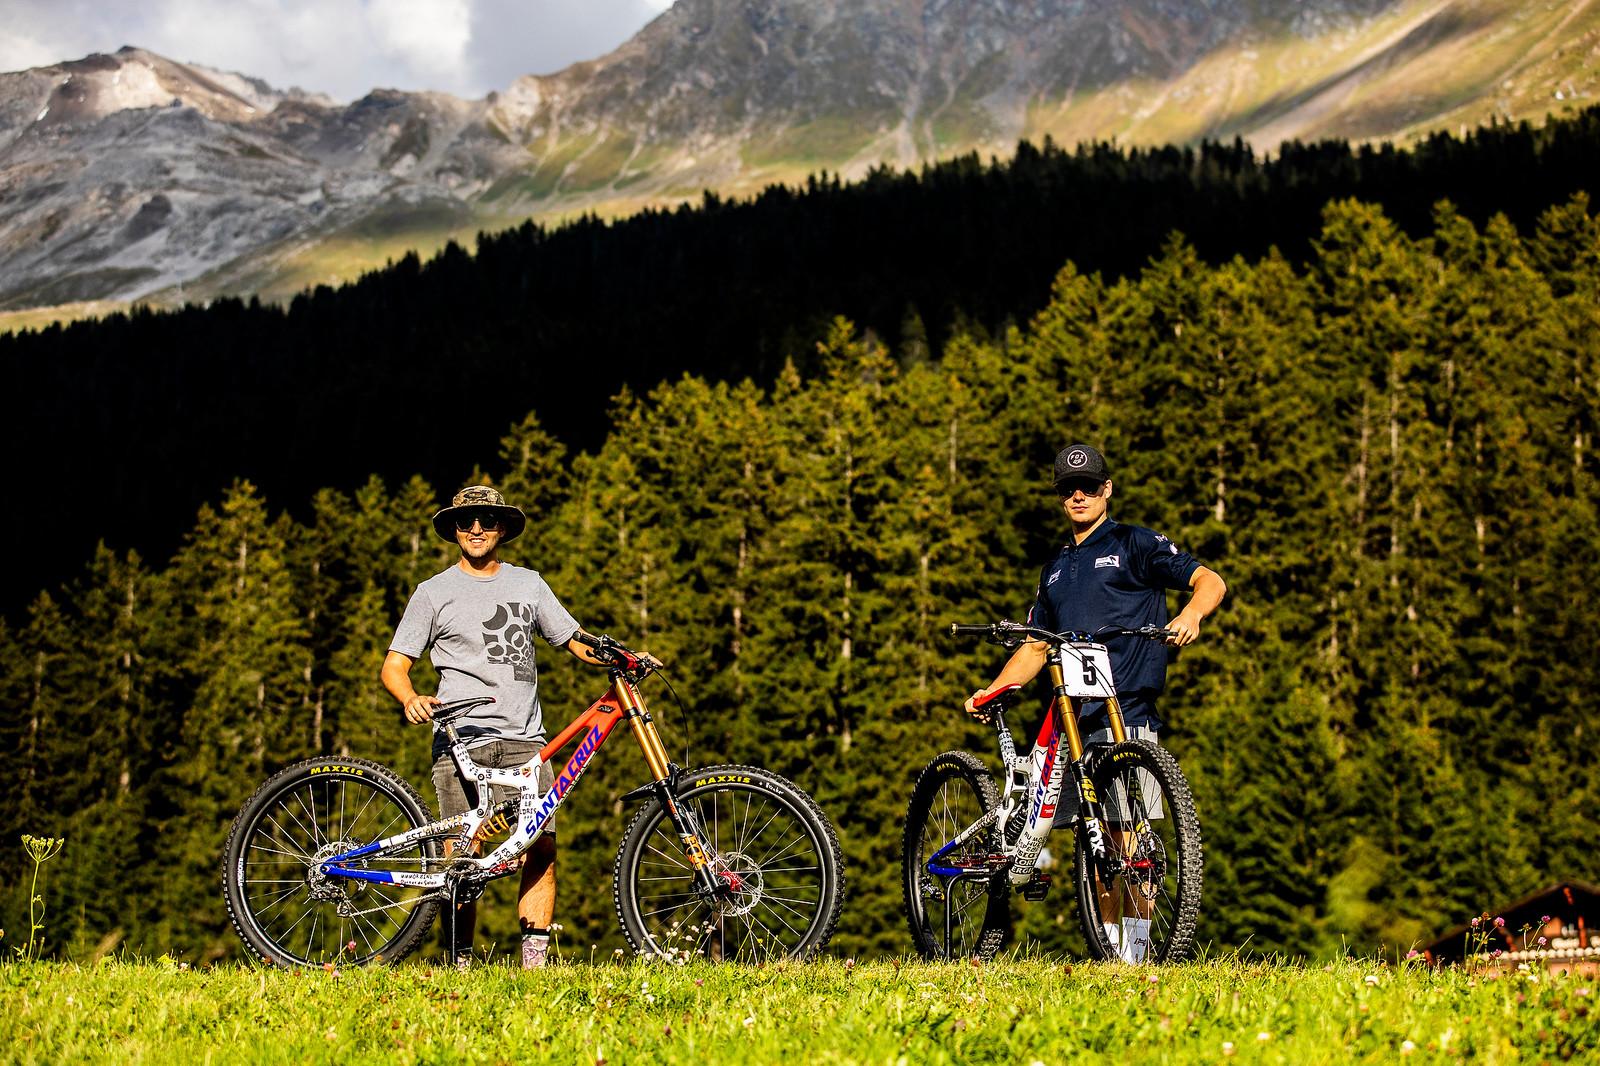 Proud - WORLD CHAMPS BIKES - Loris Vergier's Santa Cruz V10s - Mountain Biking Pictures - Vital MTB